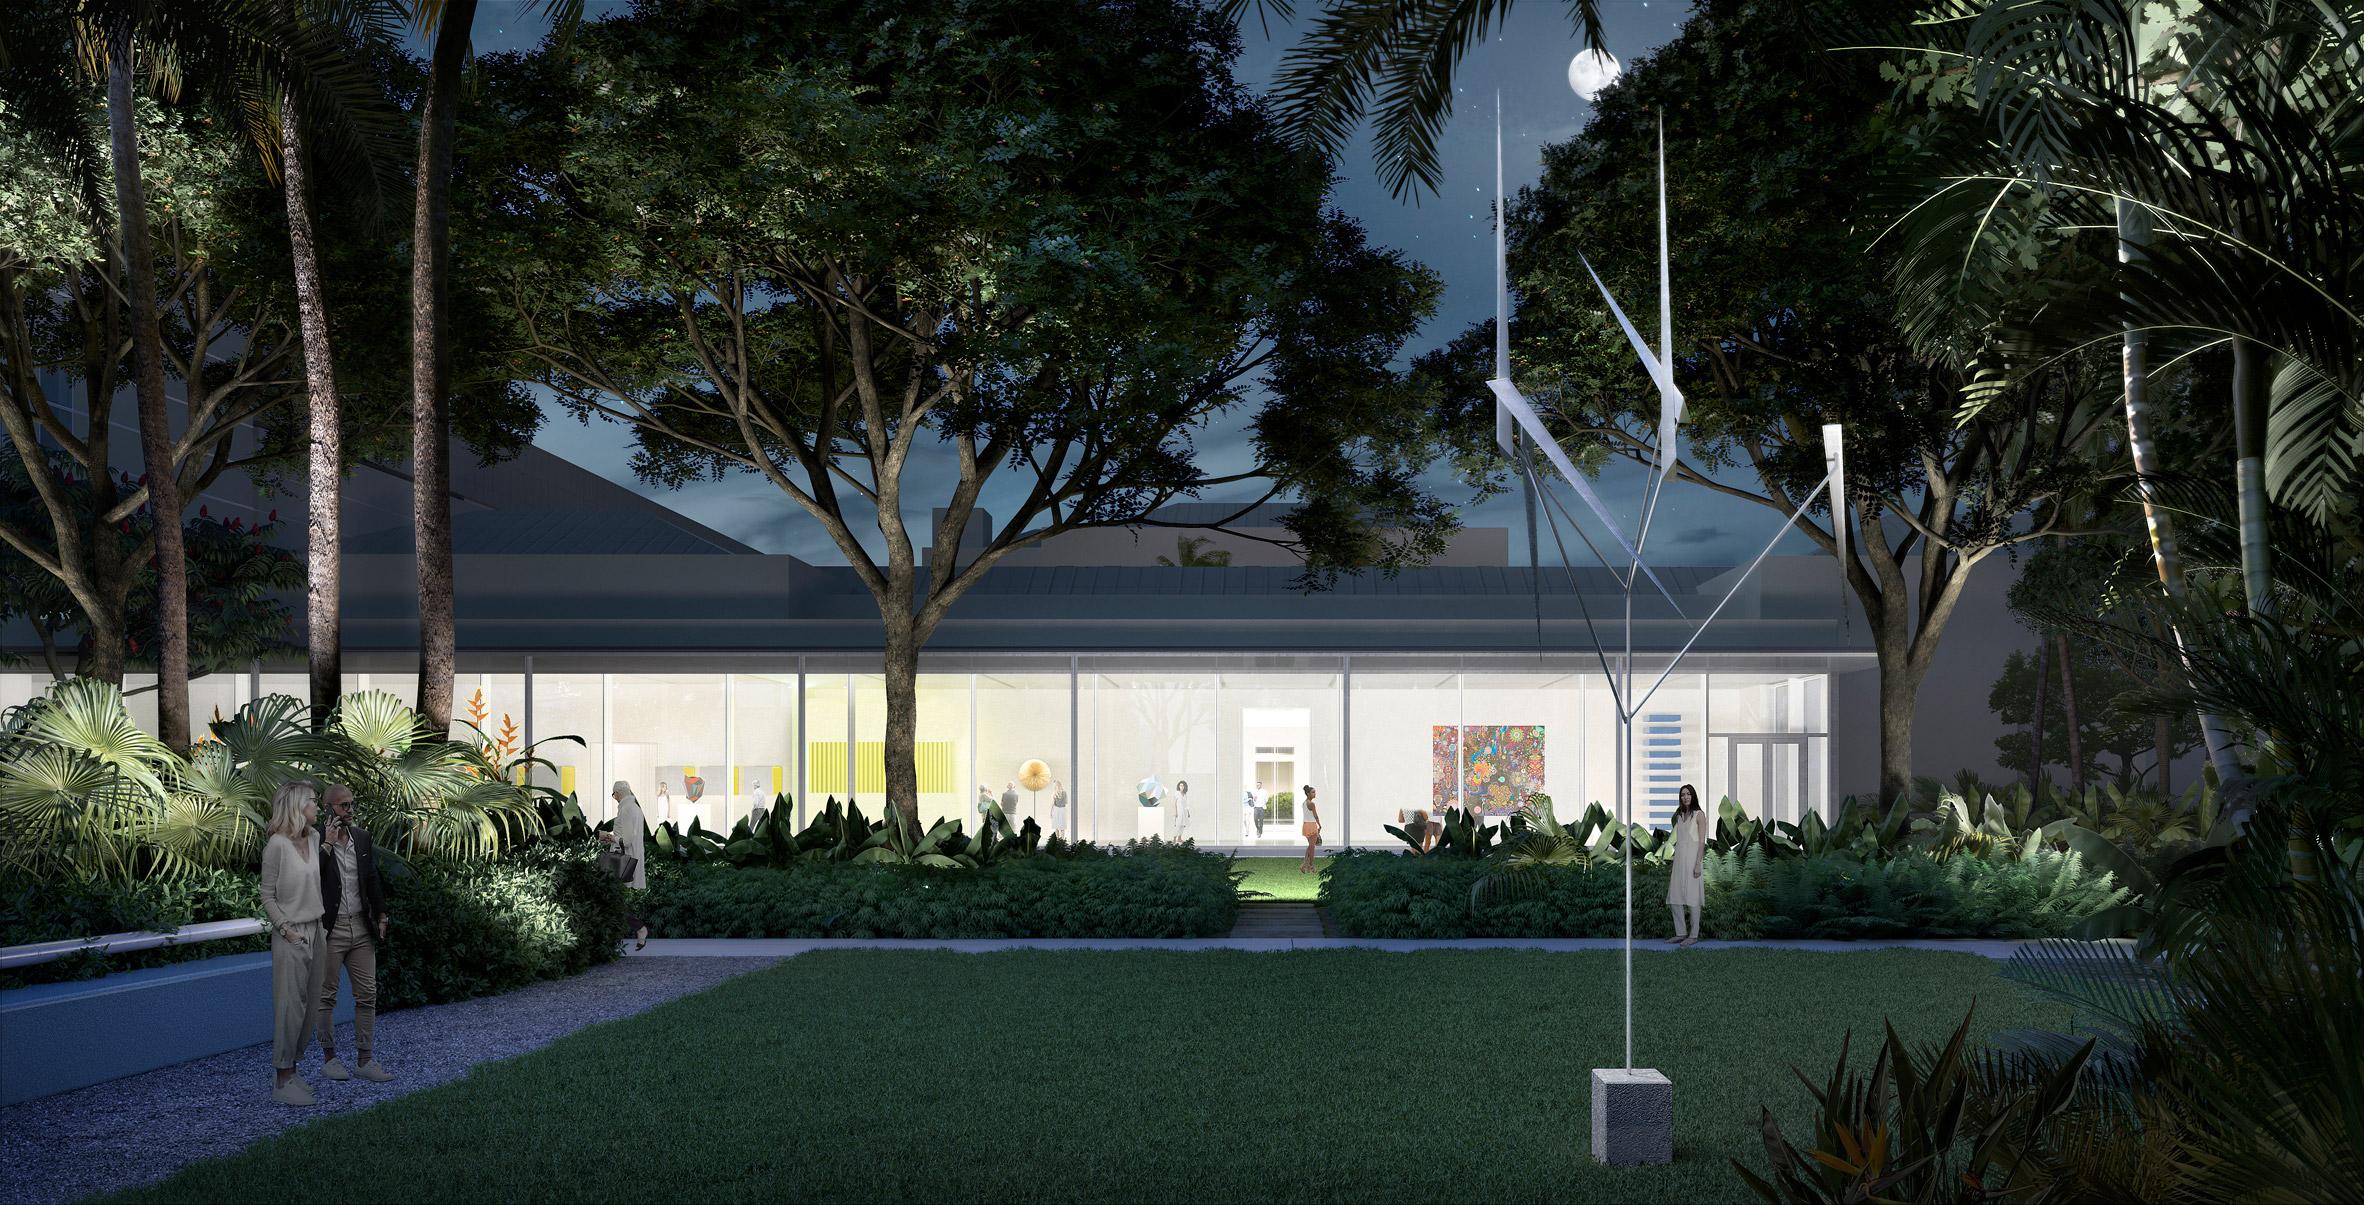 Foster reveals botanic sculpture garden for Florida's Norton Museum of Art